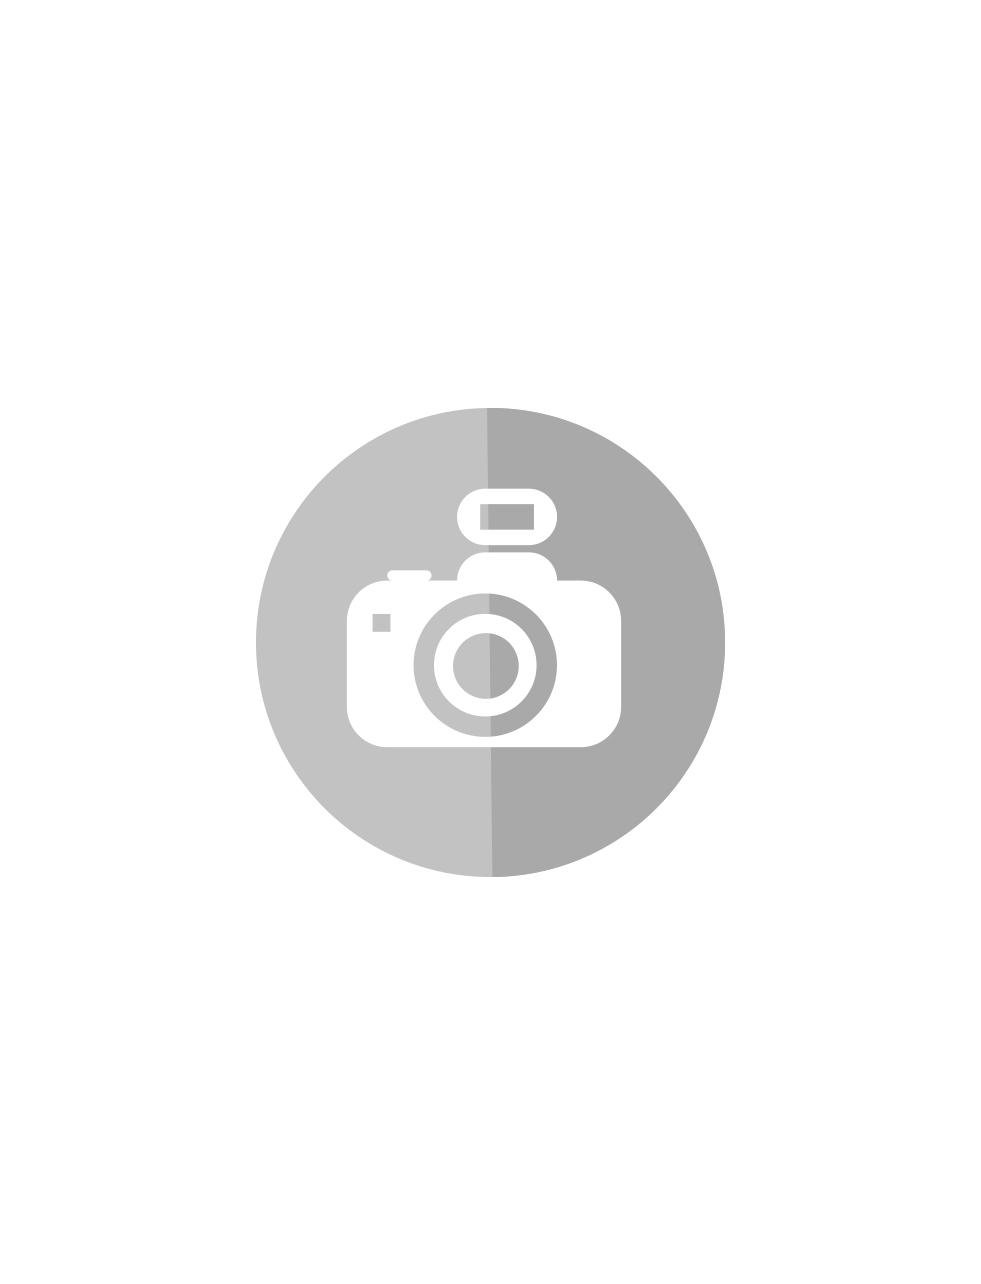 30058342_sparepart/Miniklappbox-Tür